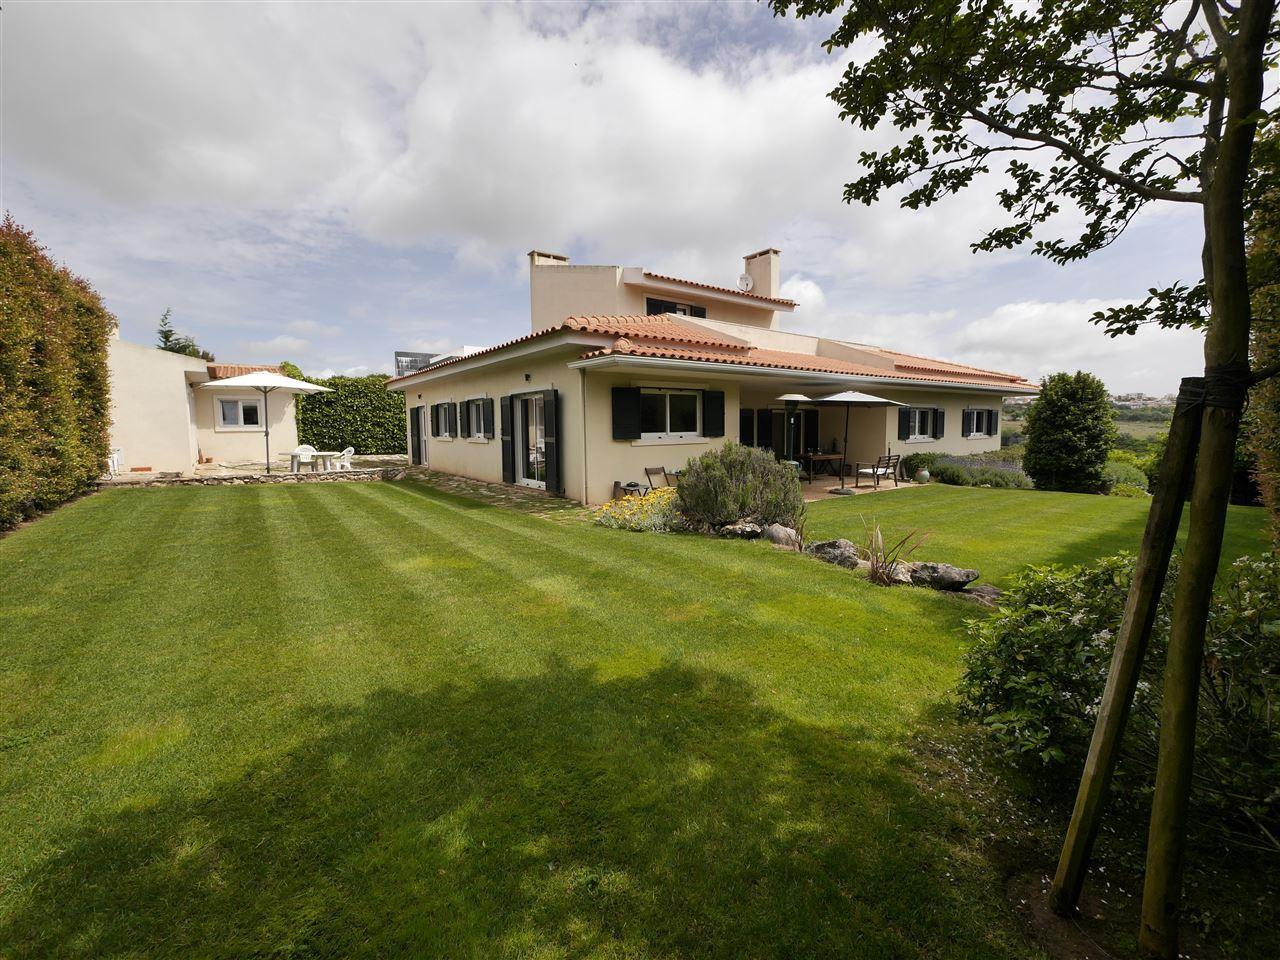 独户住宅 为 销售 在 House, 7 bedrooms, for Sale Quinta Da Moura, Oeiras, 葡京 葡萄牙